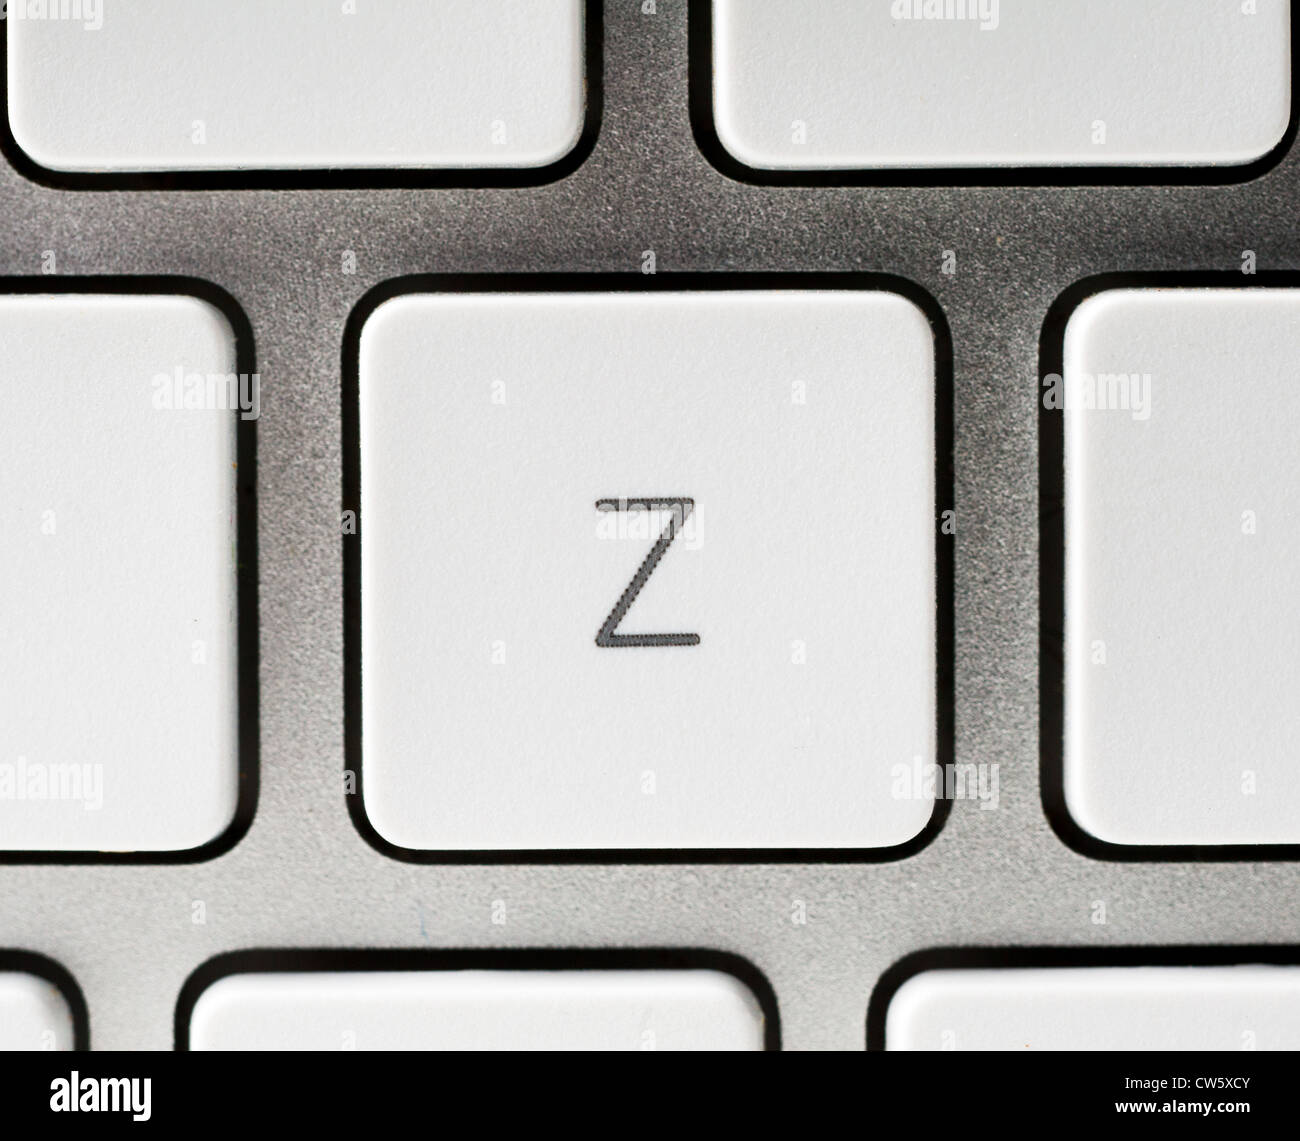 Letter Z on an Apple keyboard - Stock Image